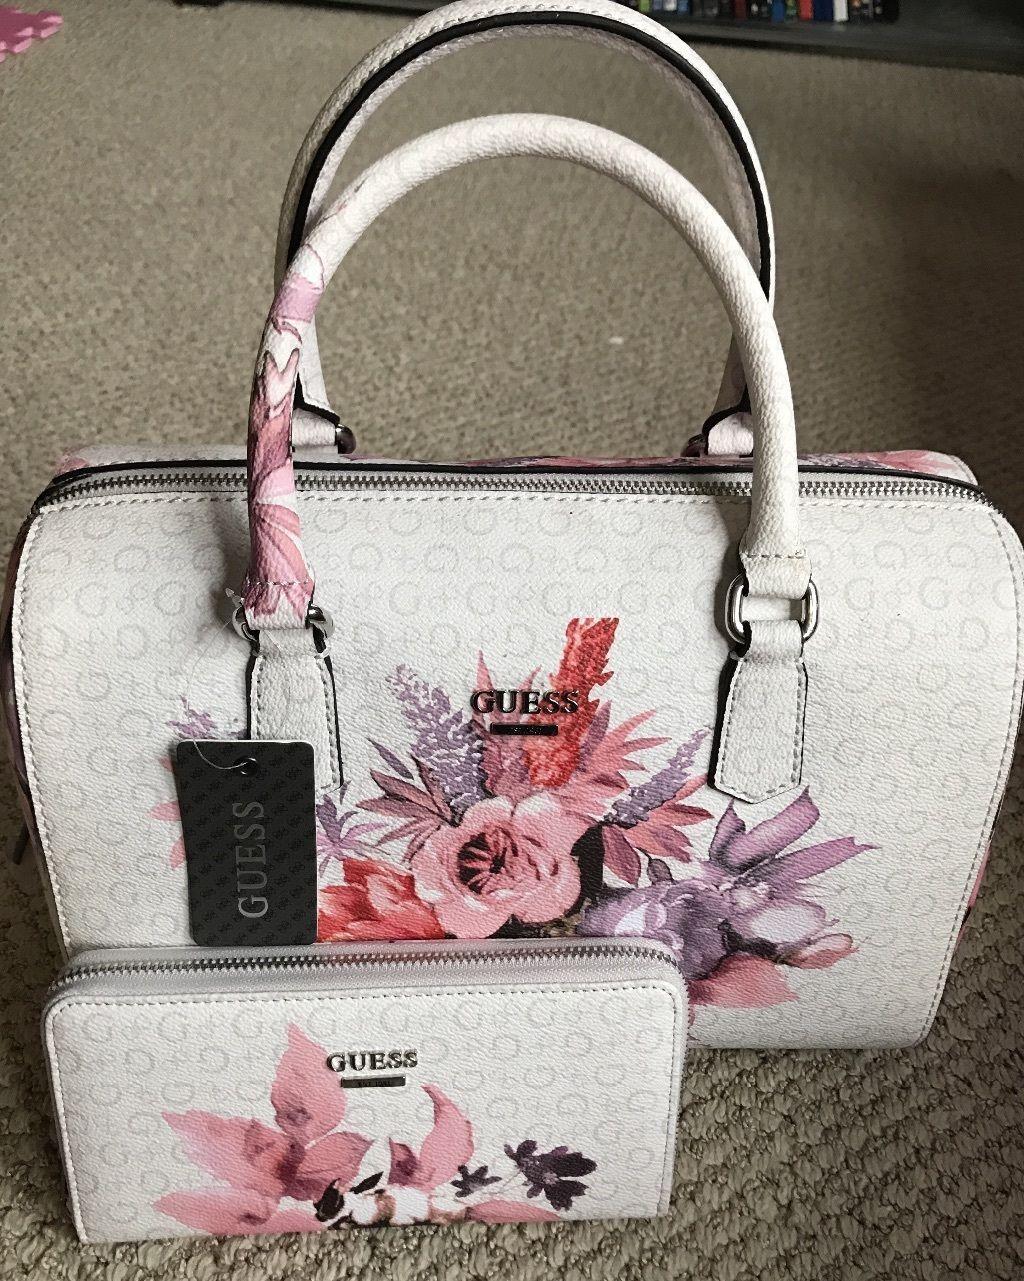 Guess Ashville Bag Fl Wallet Set White Pink Rose Box